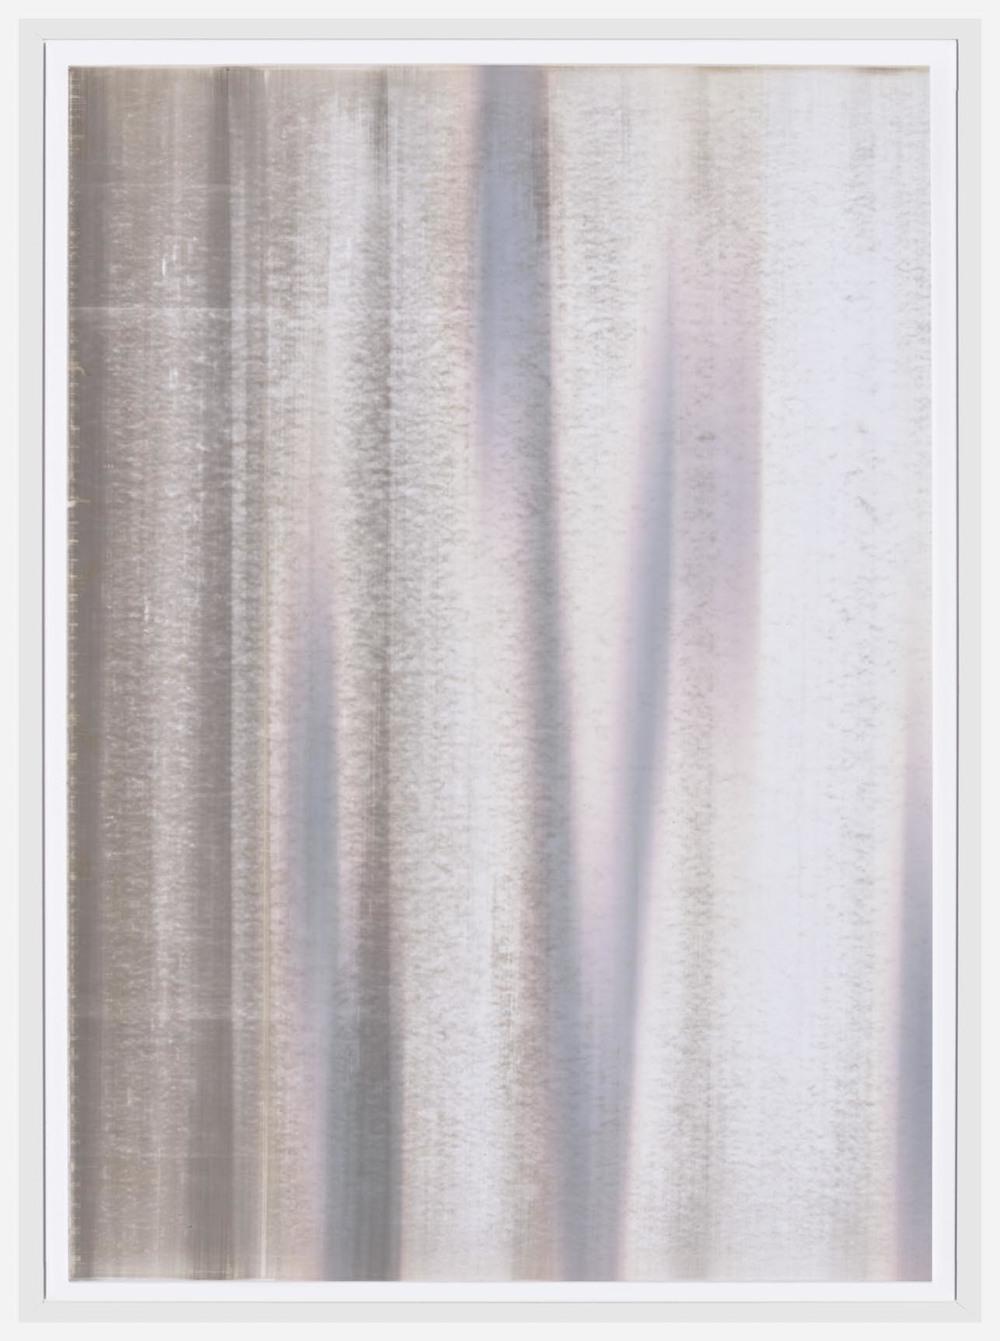 Wolfgang Tillmans Silver 61 (II II 00) 2000 c-prints 54.3 x 33.9 cm